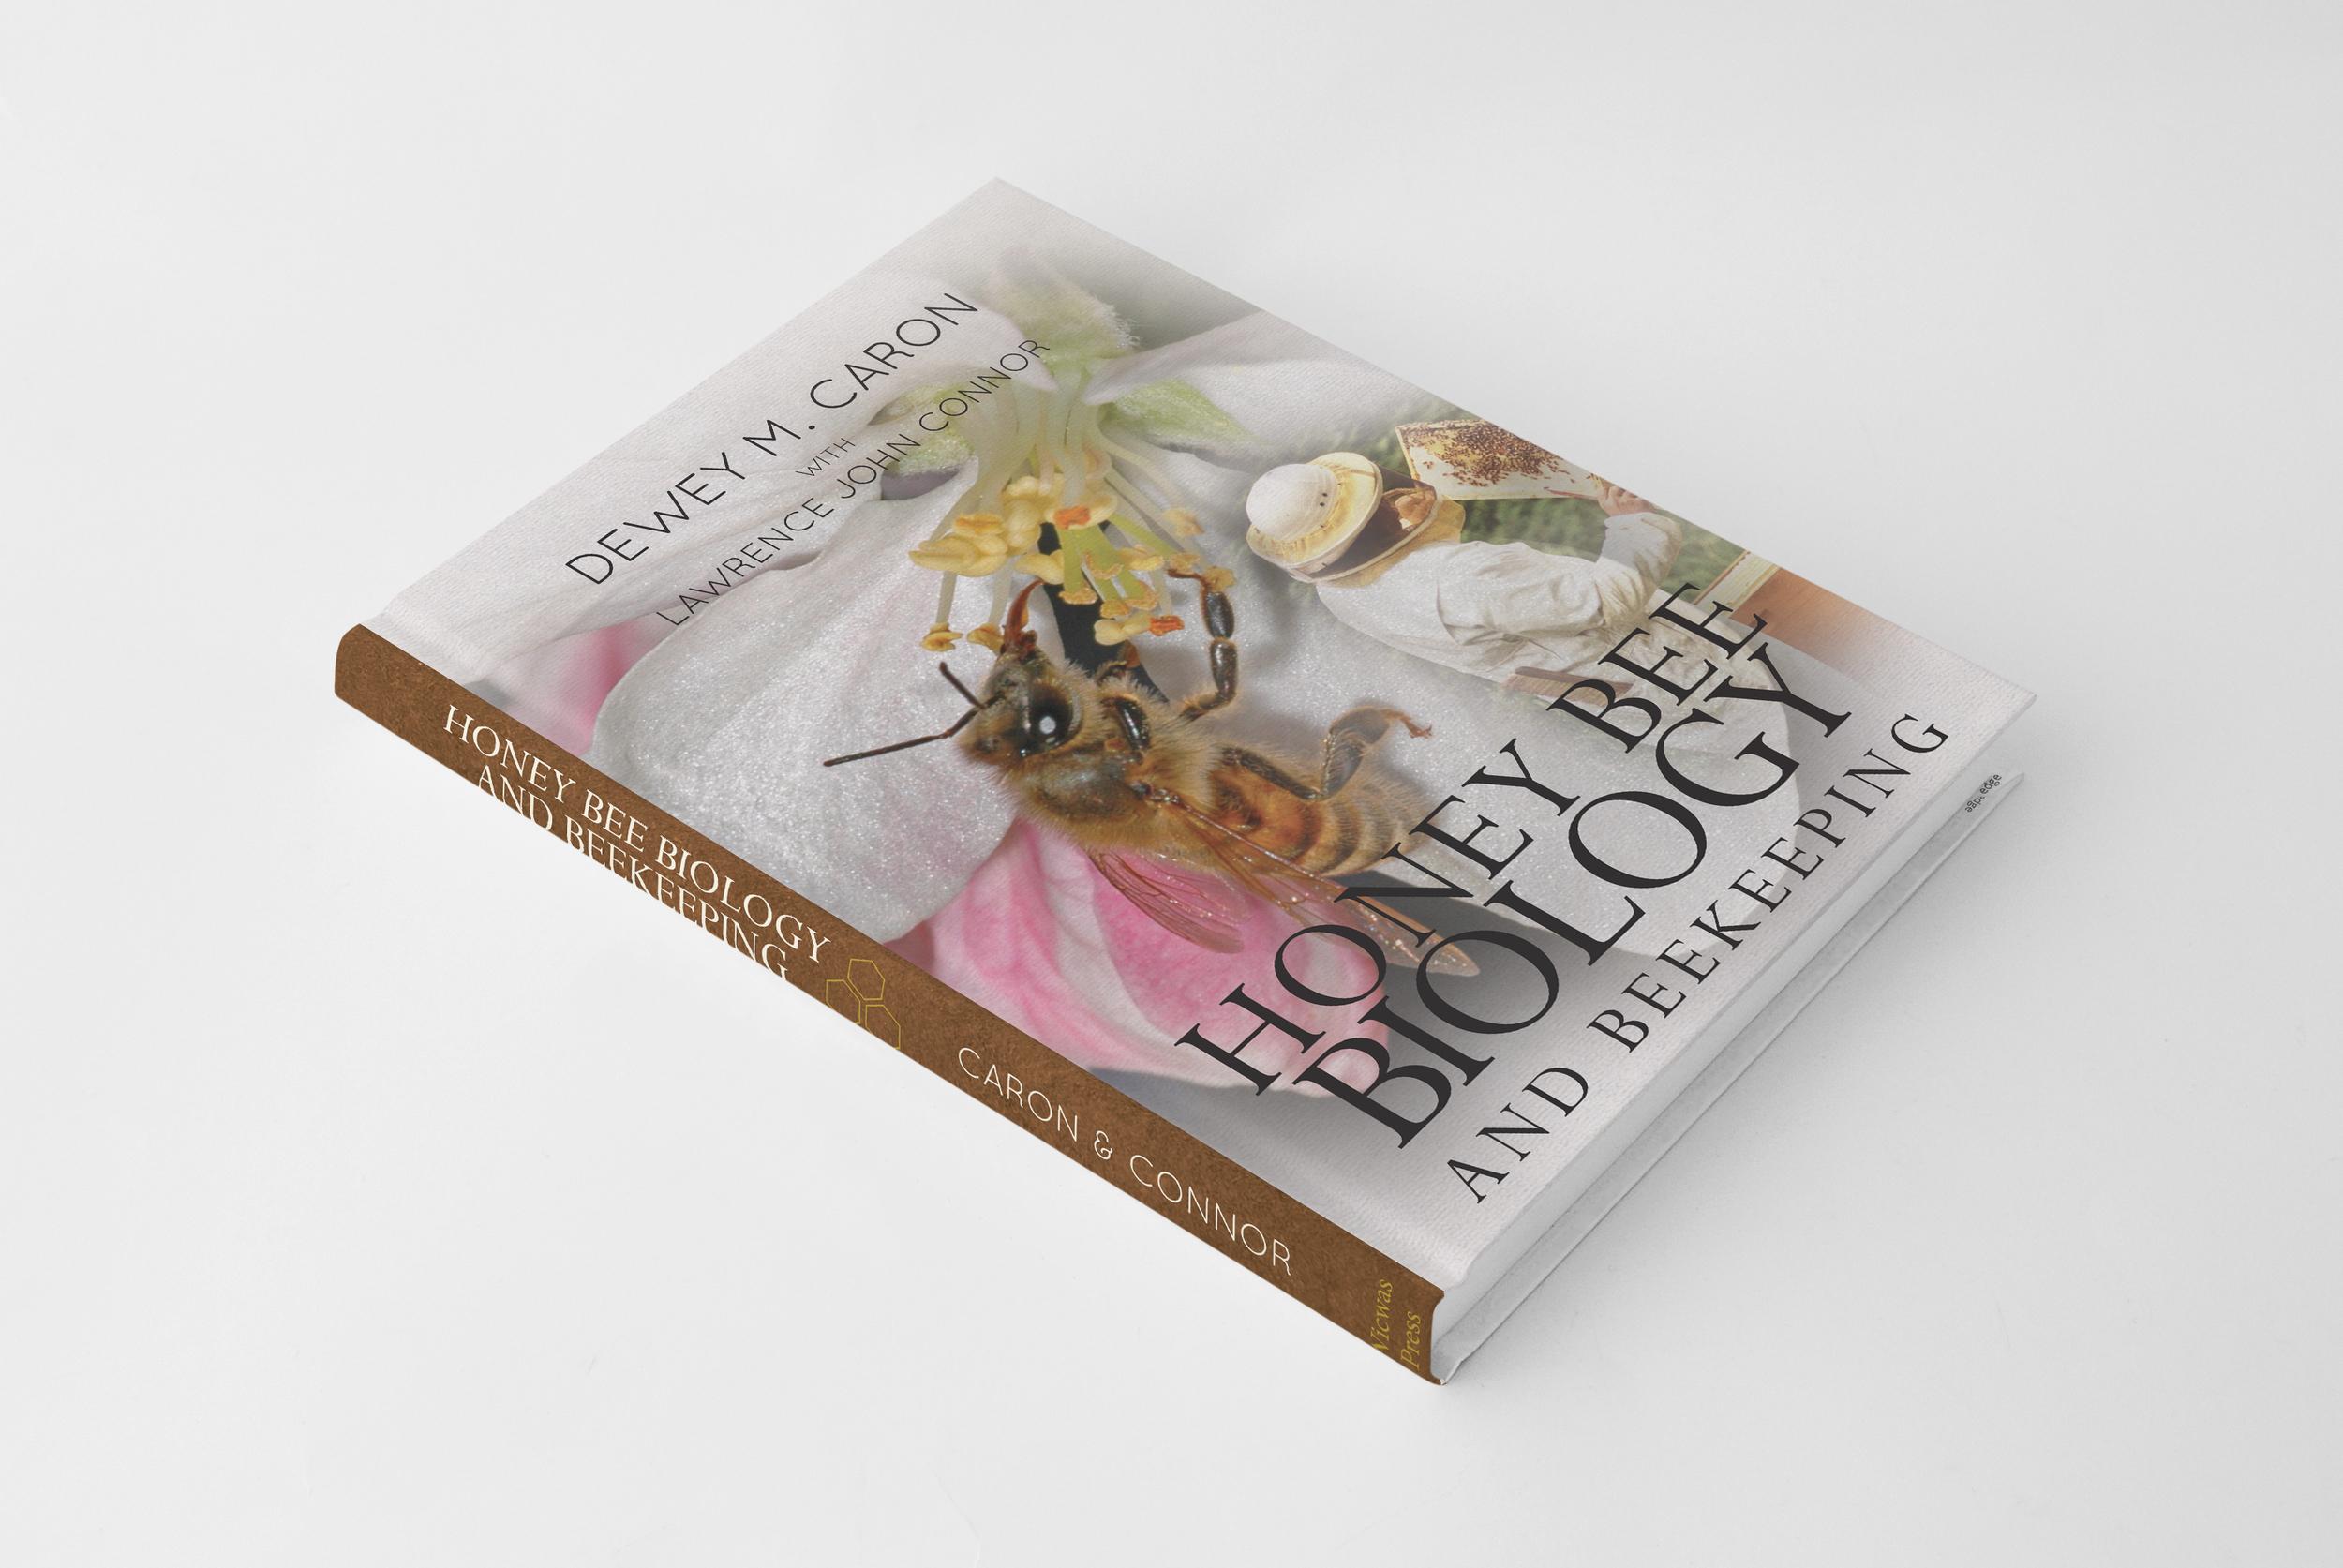 Honey Bee Biology Hard Cover Design